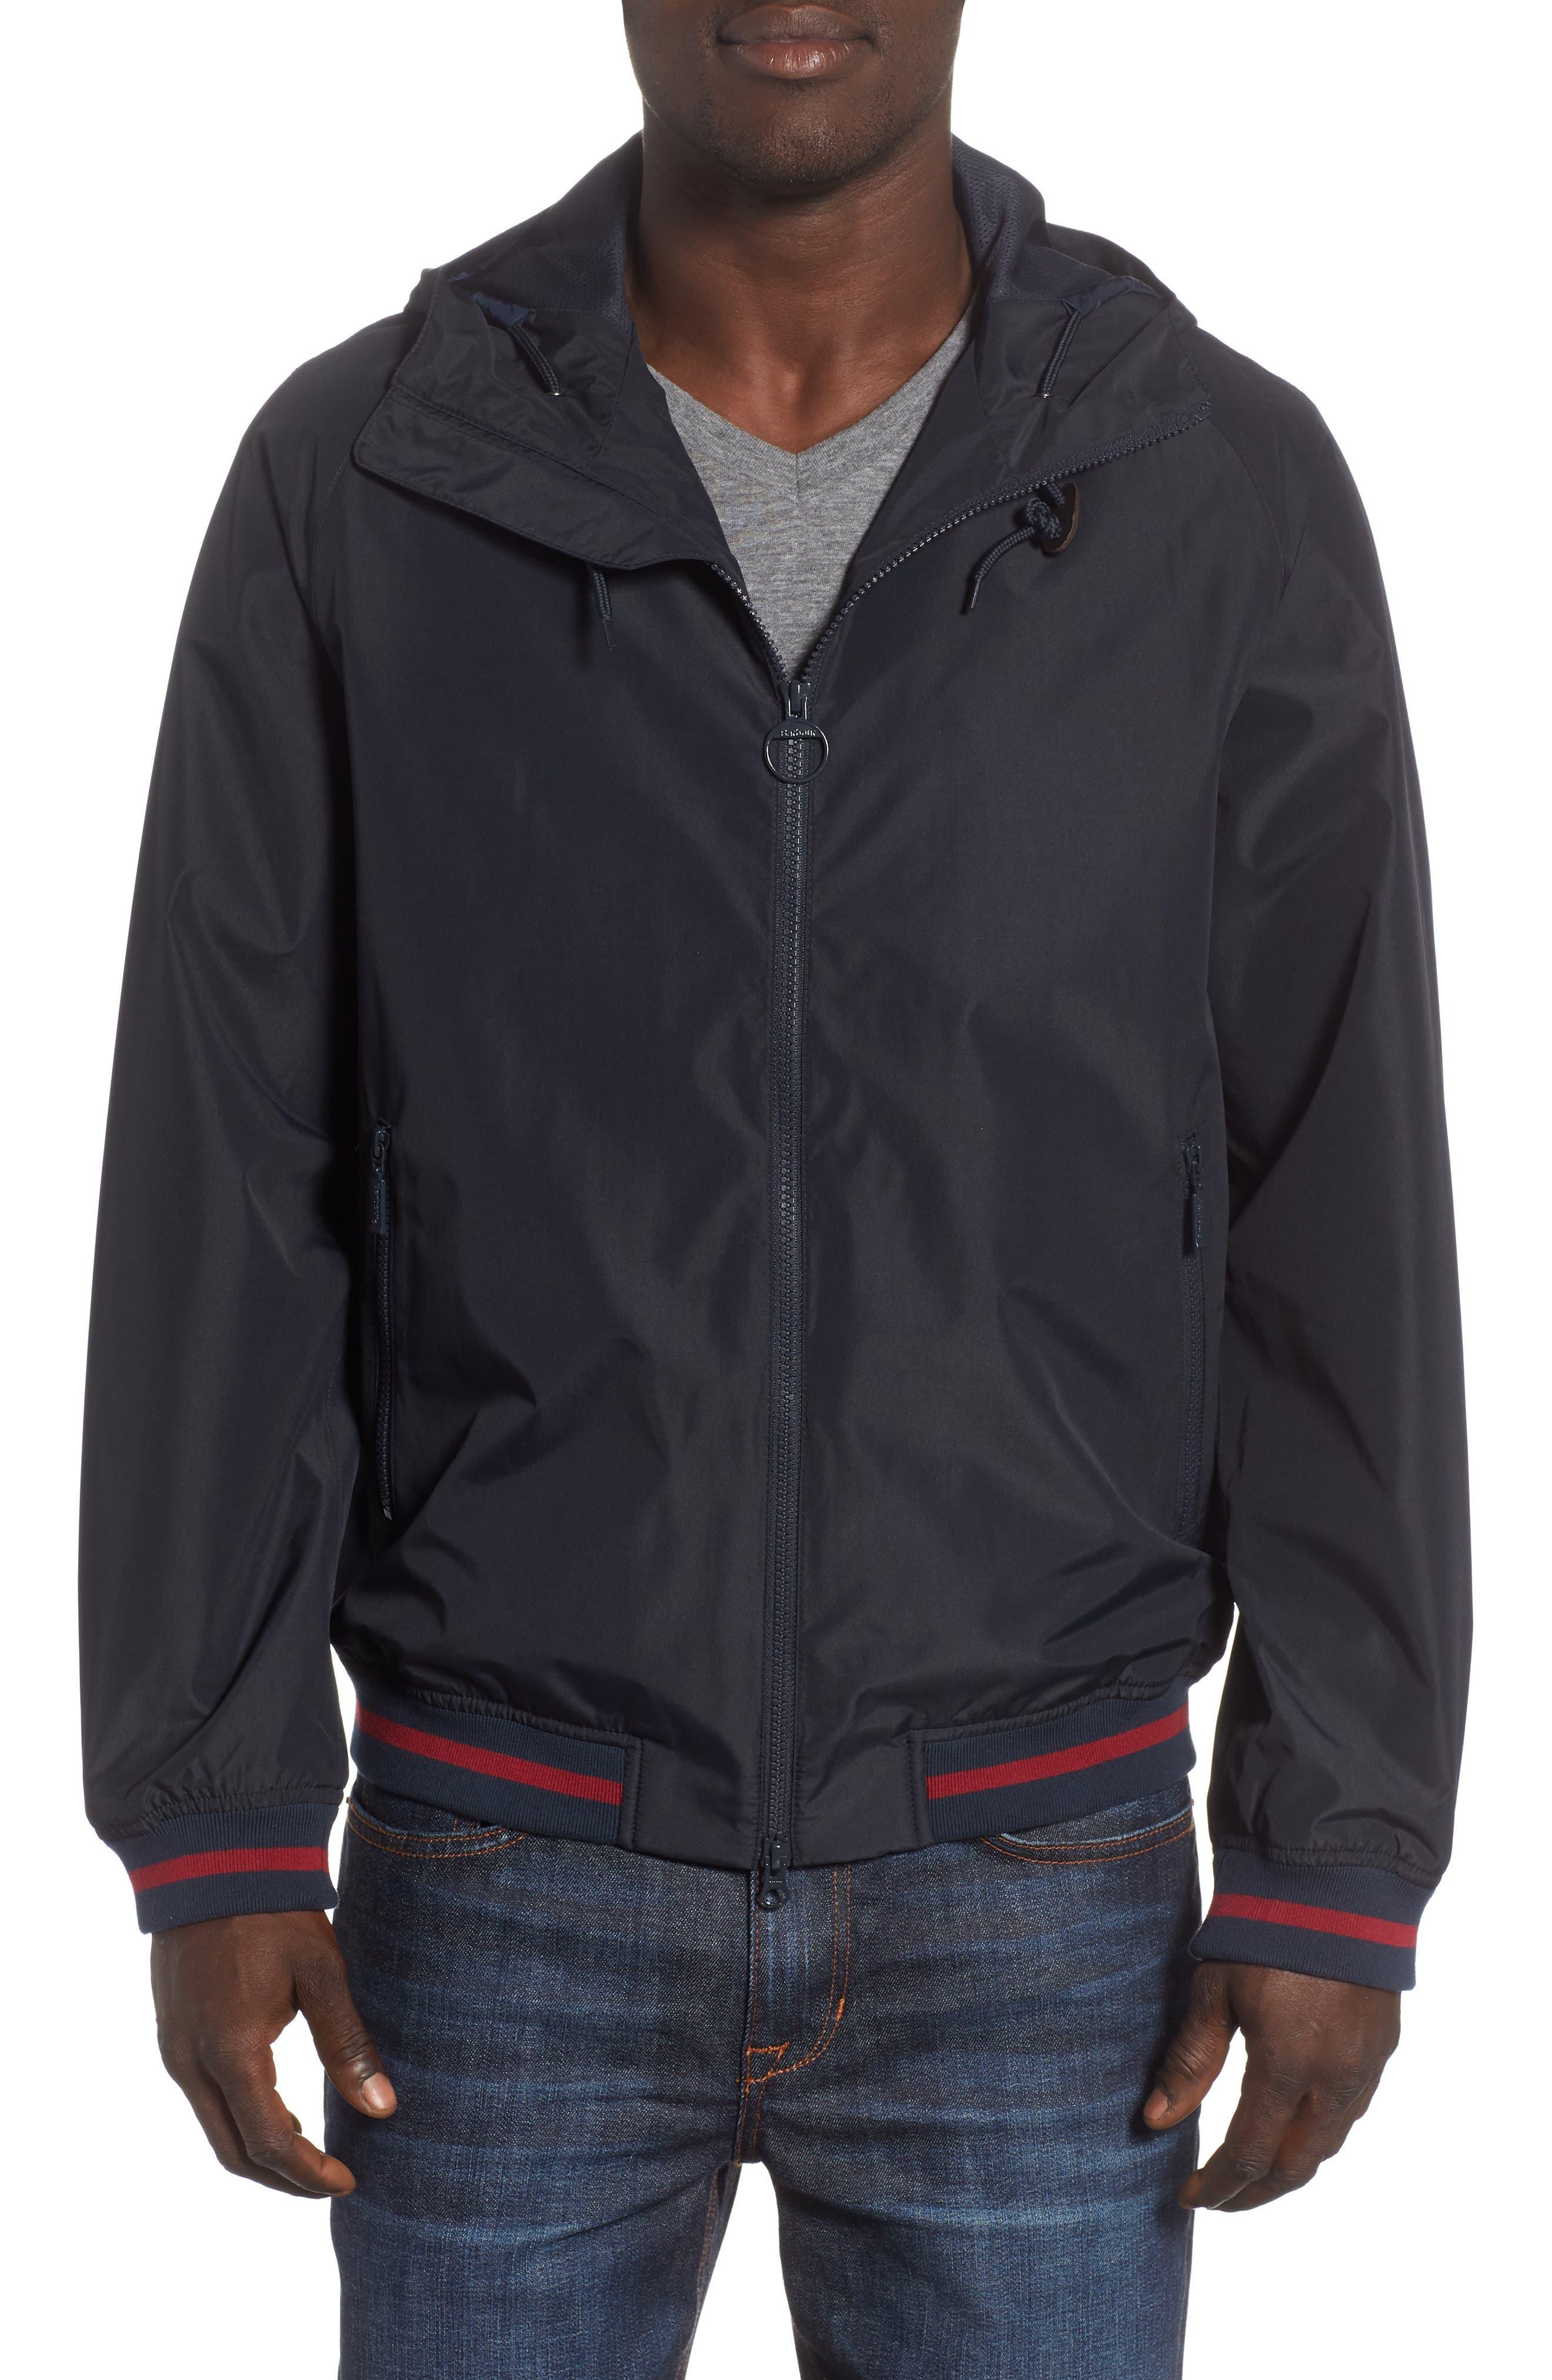 Twent Waterproof Jacket,                             Main thumbnail 1, color,                             Navy